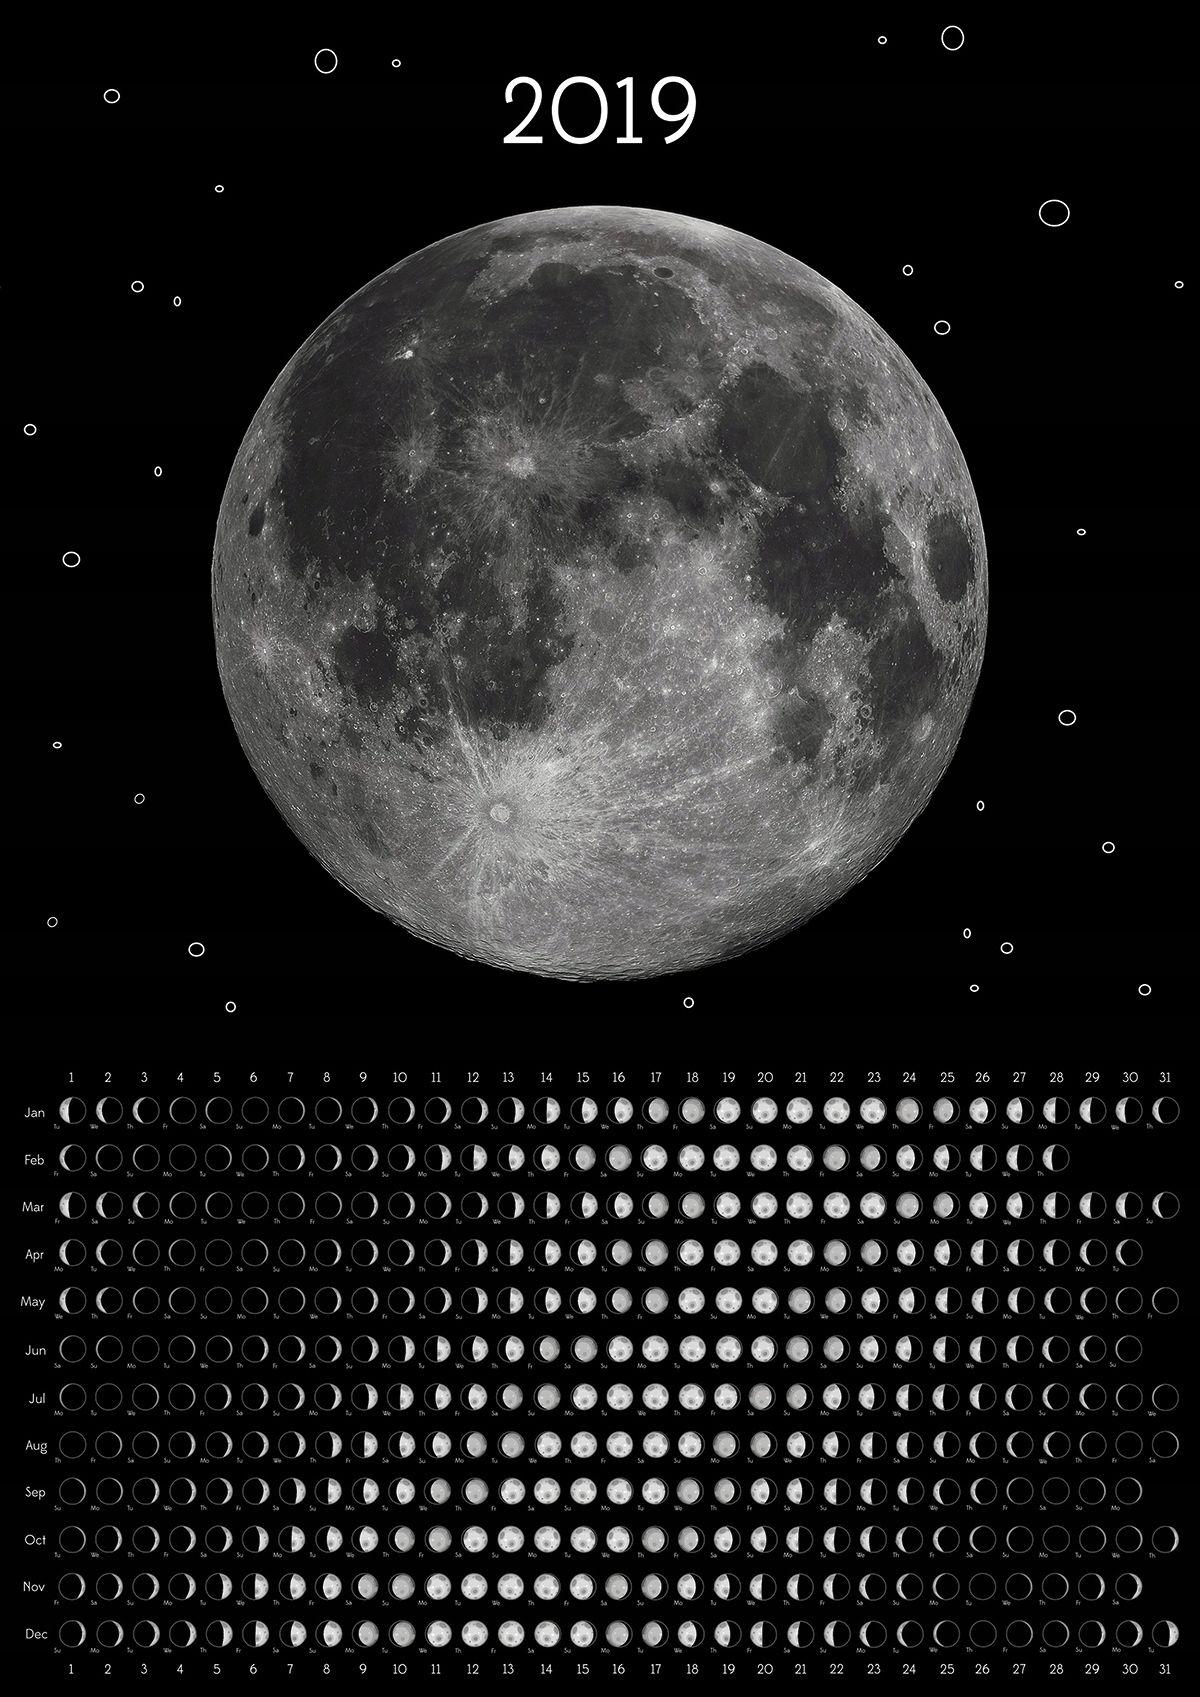 Kalendarz 2019 Fazy Ksiezyca Mysliwski A2 7714416514 Oficjalne Archiwum Allegro Moon Calendar Moon Phase Calendar Astronomy